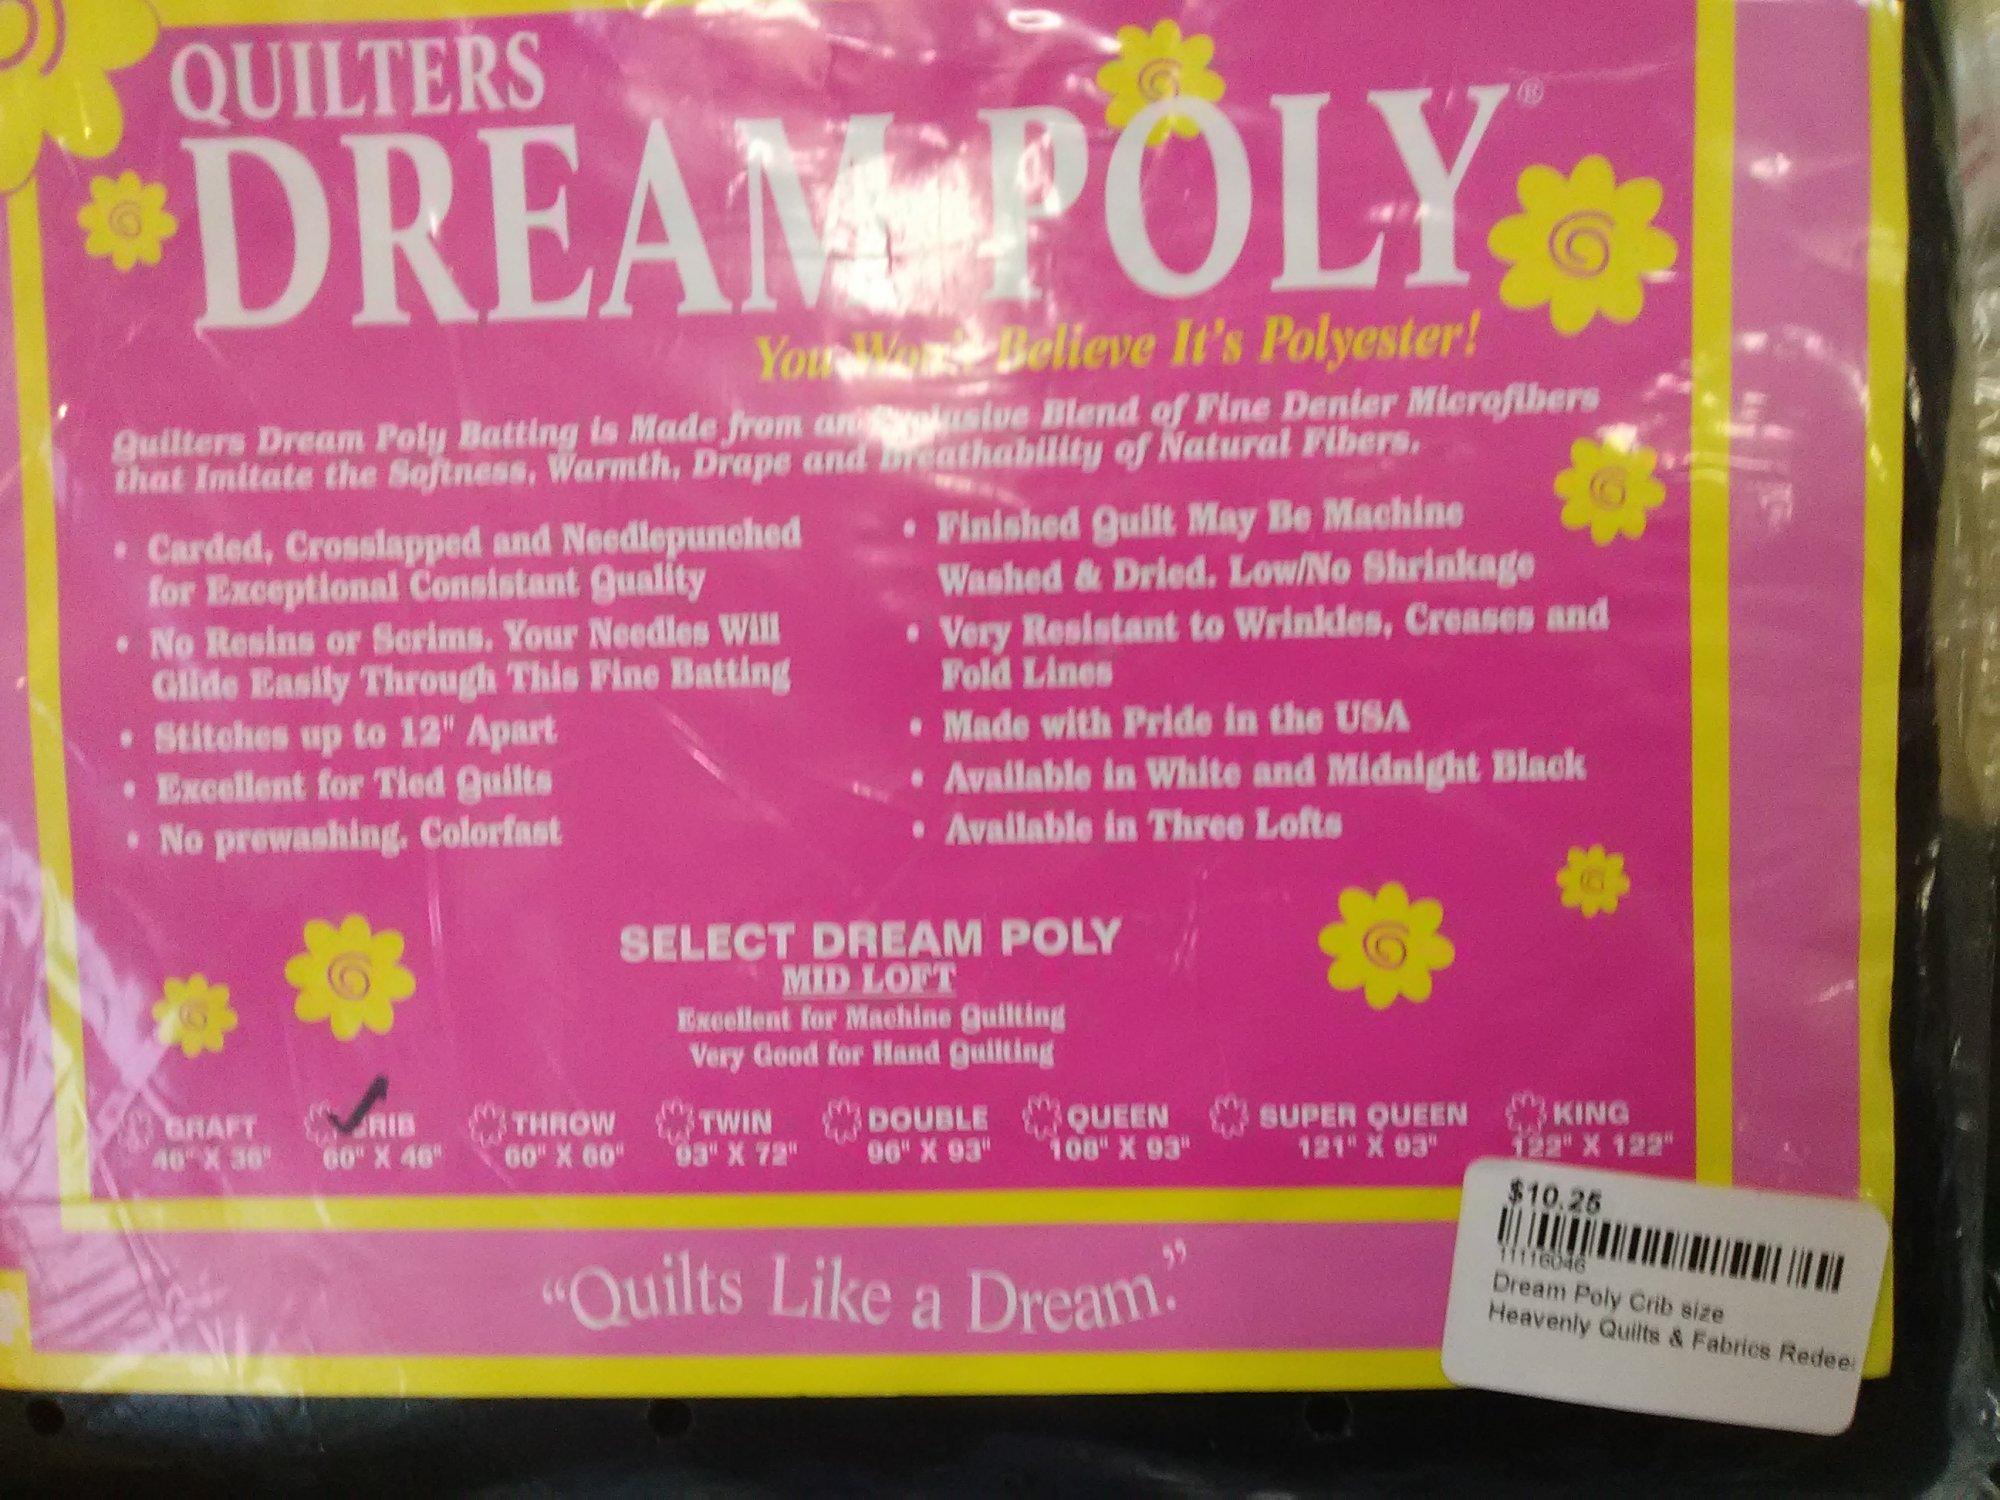 Dream Poly Crib size Batting